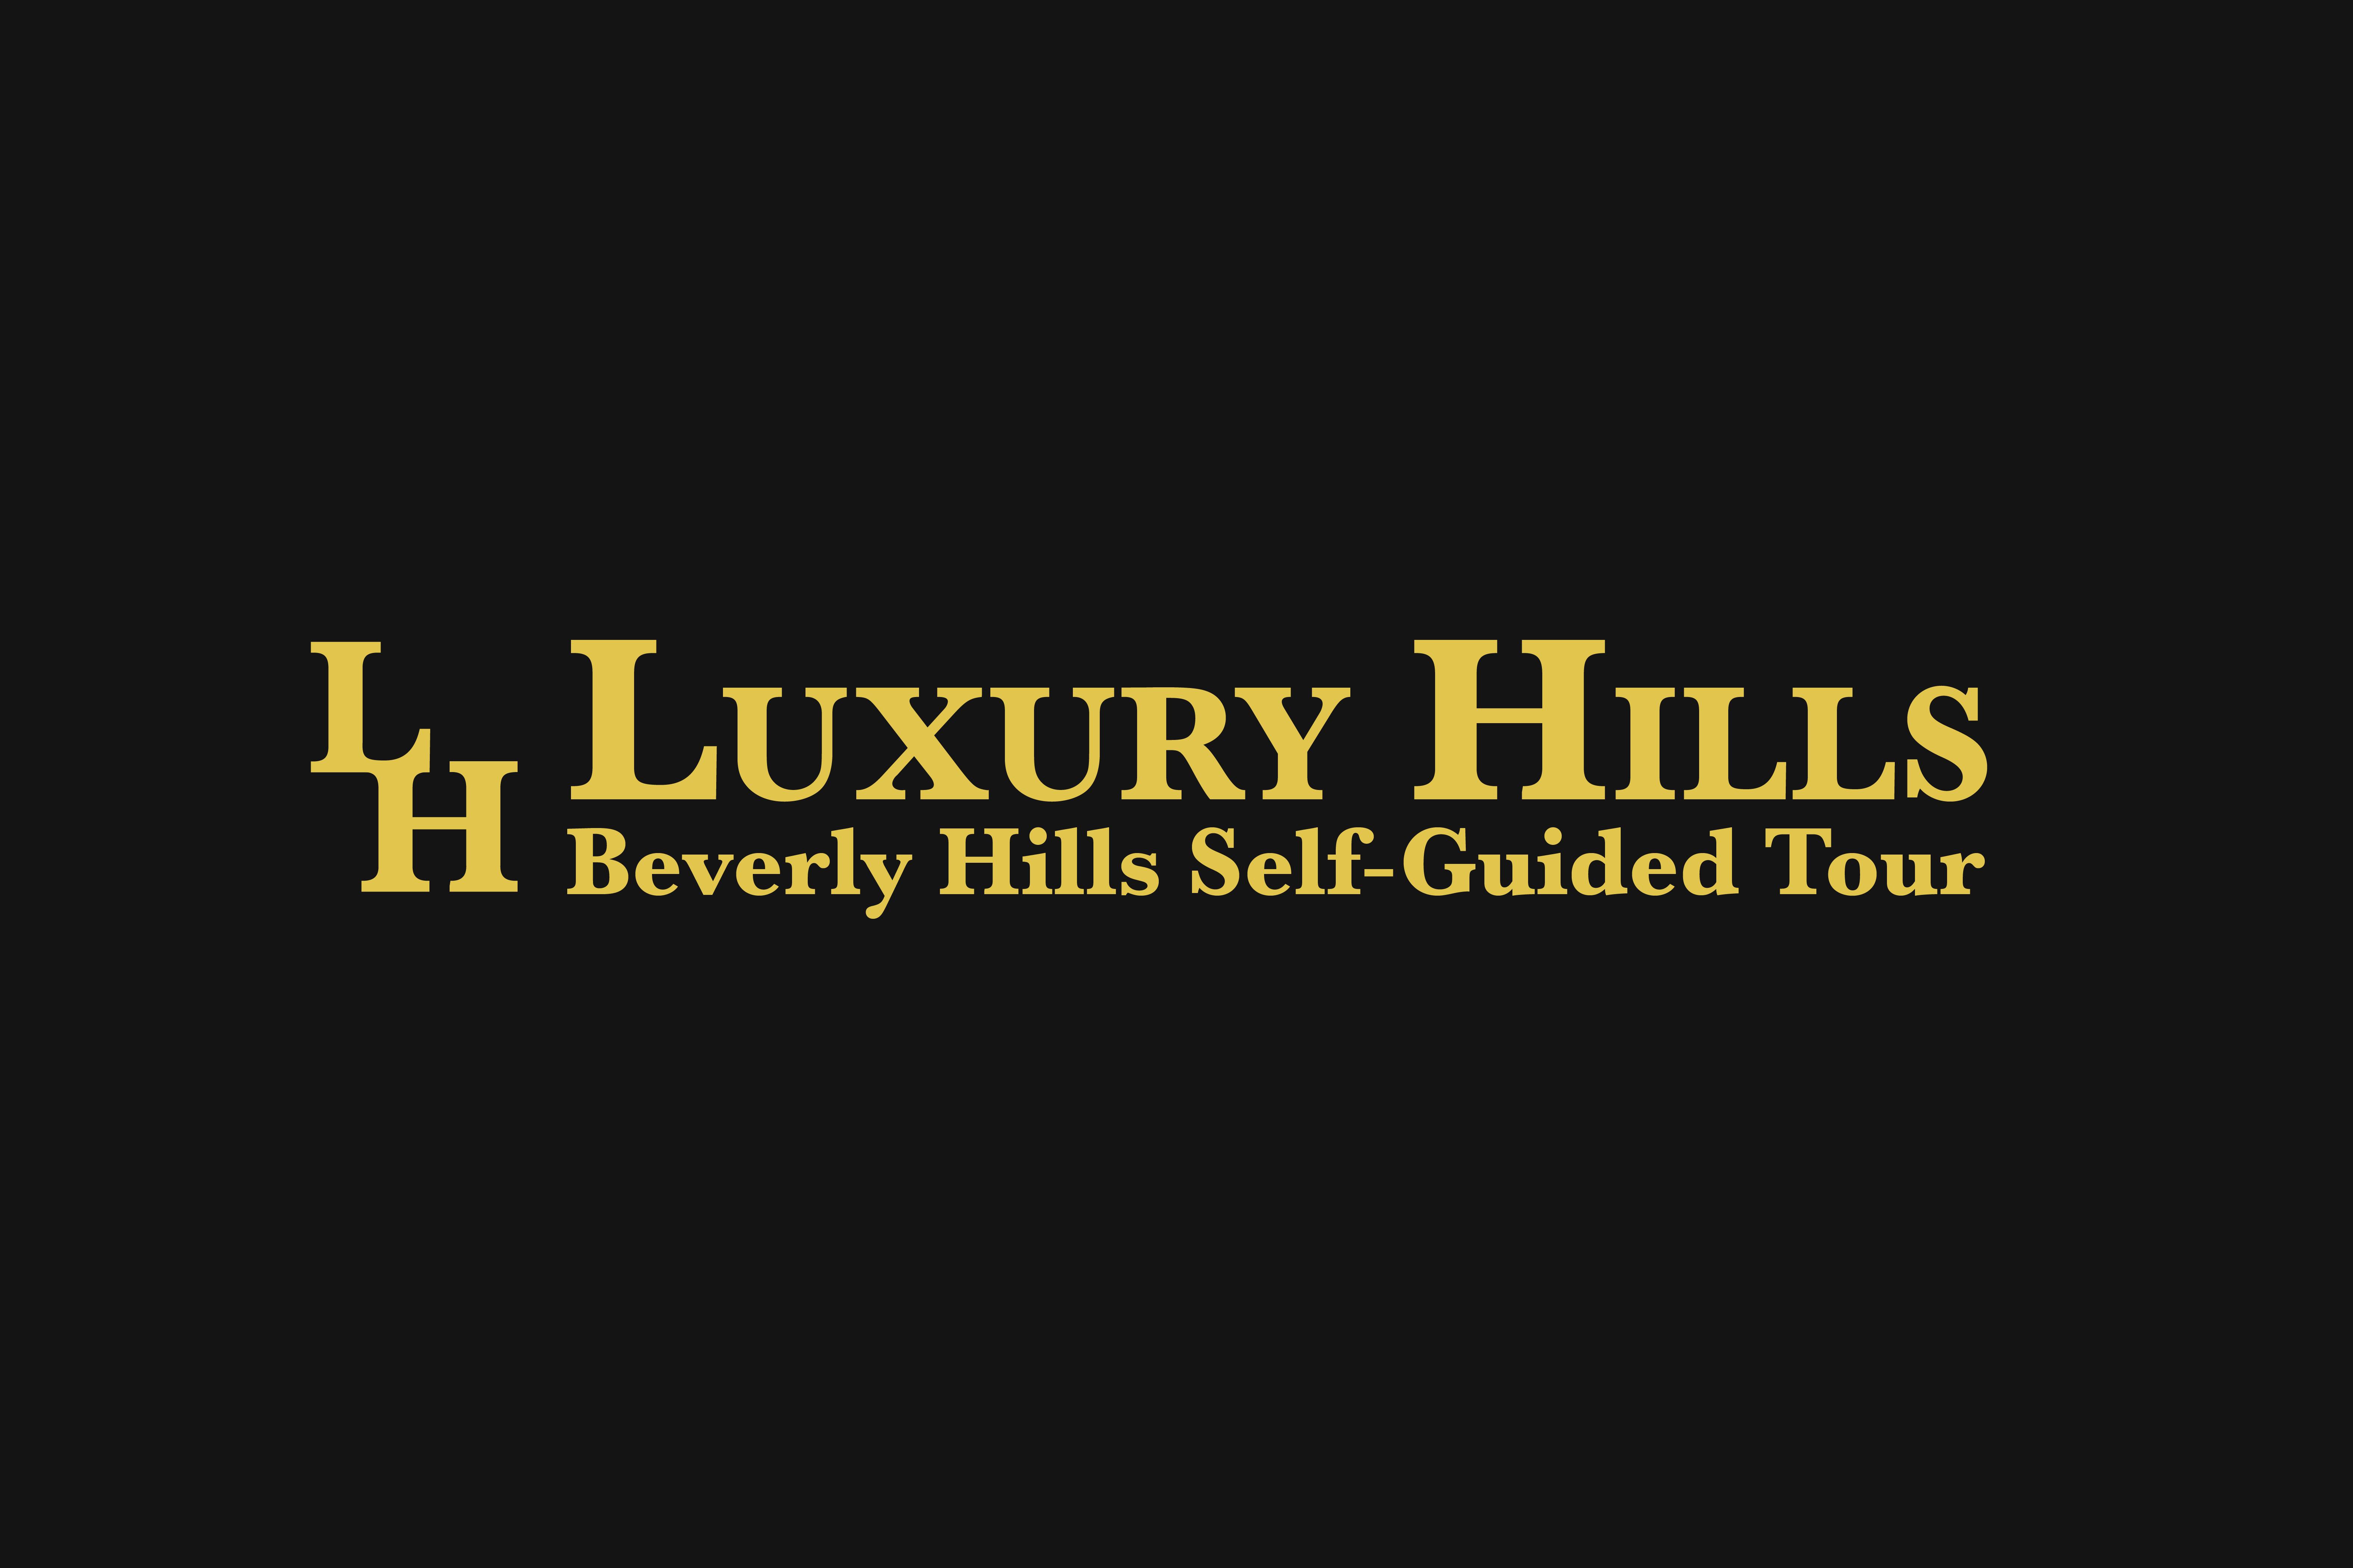 Luxury Hills